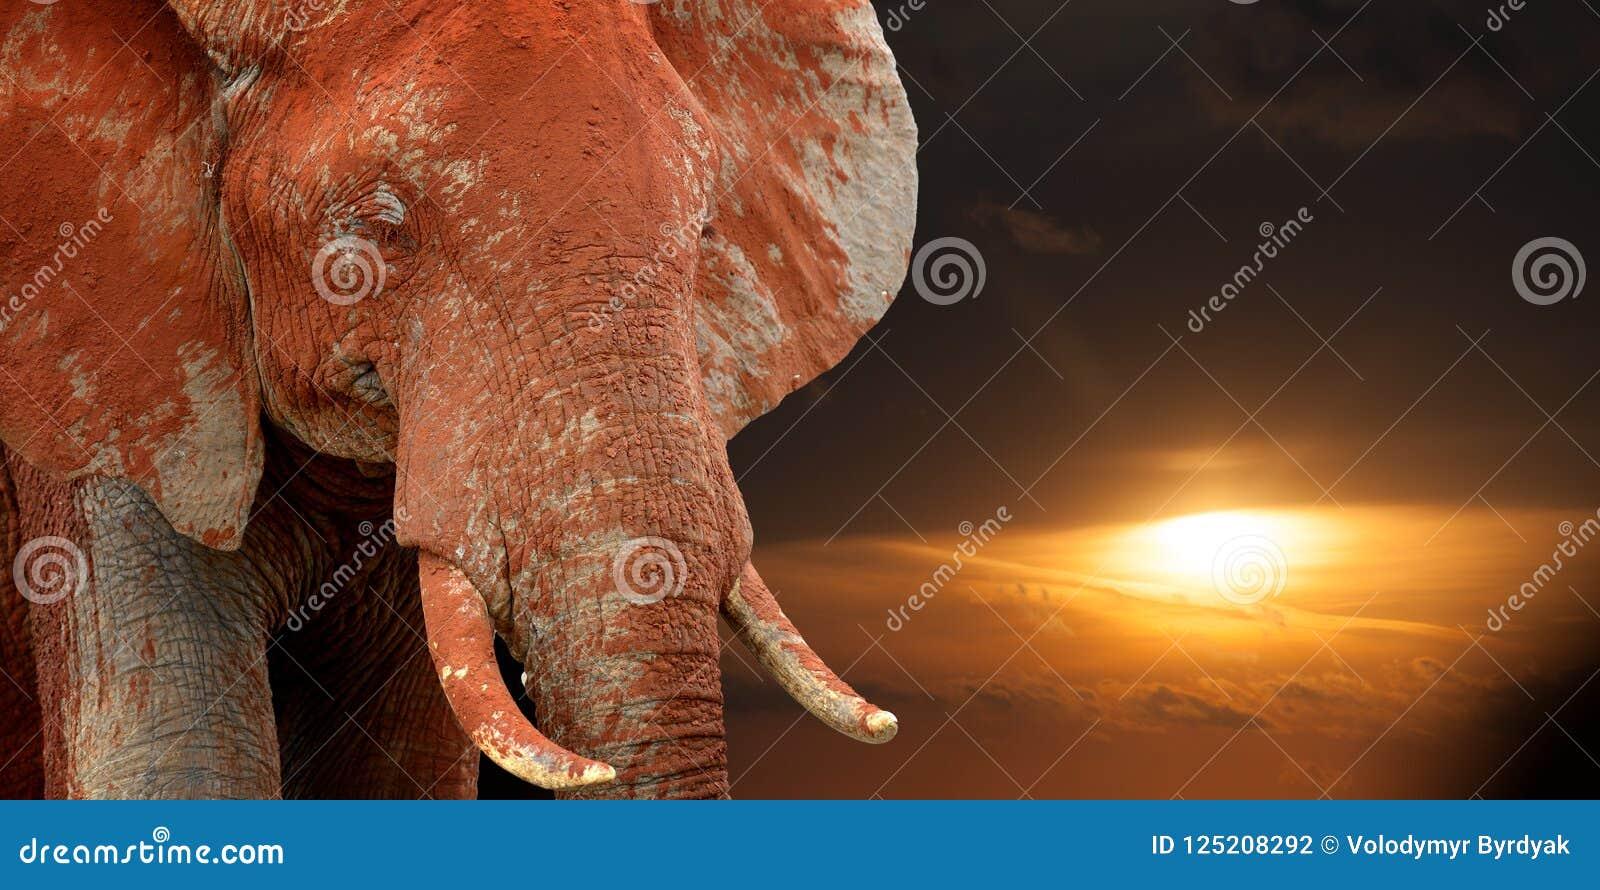 Elephant on savannah in Africa on sunset